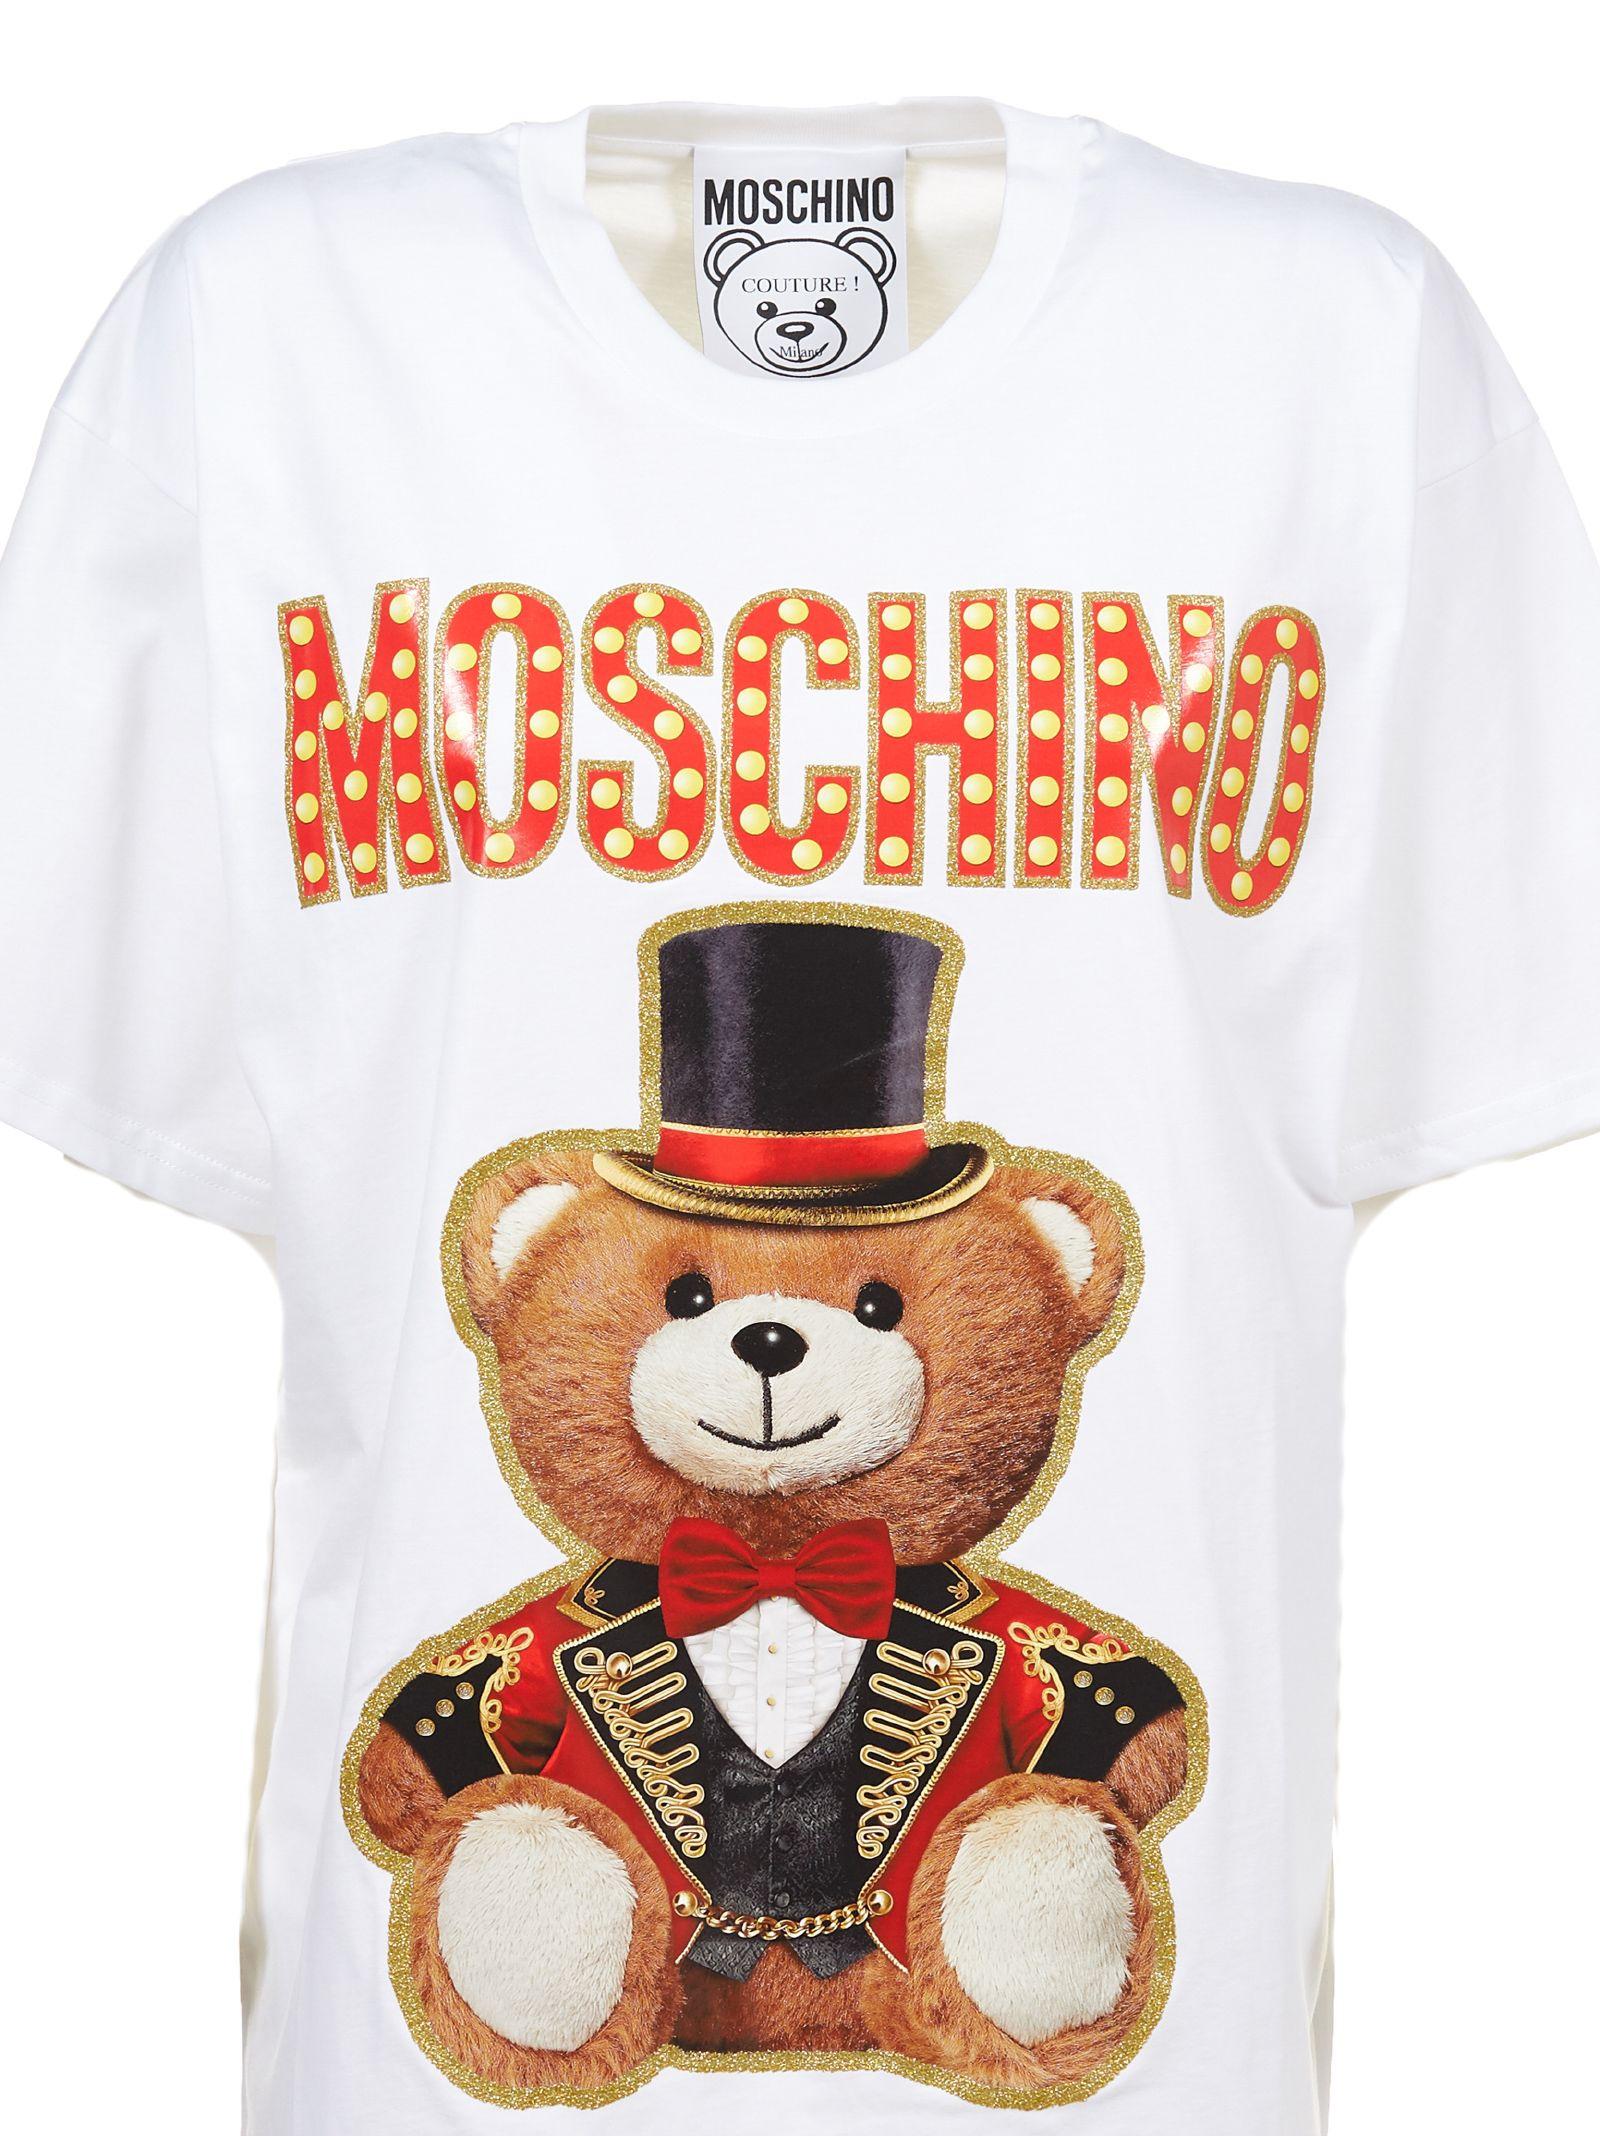 5b3d96d0 Moschino Moschino Circus Bear T-shirt - Bianco multicolor - 10817158 ...